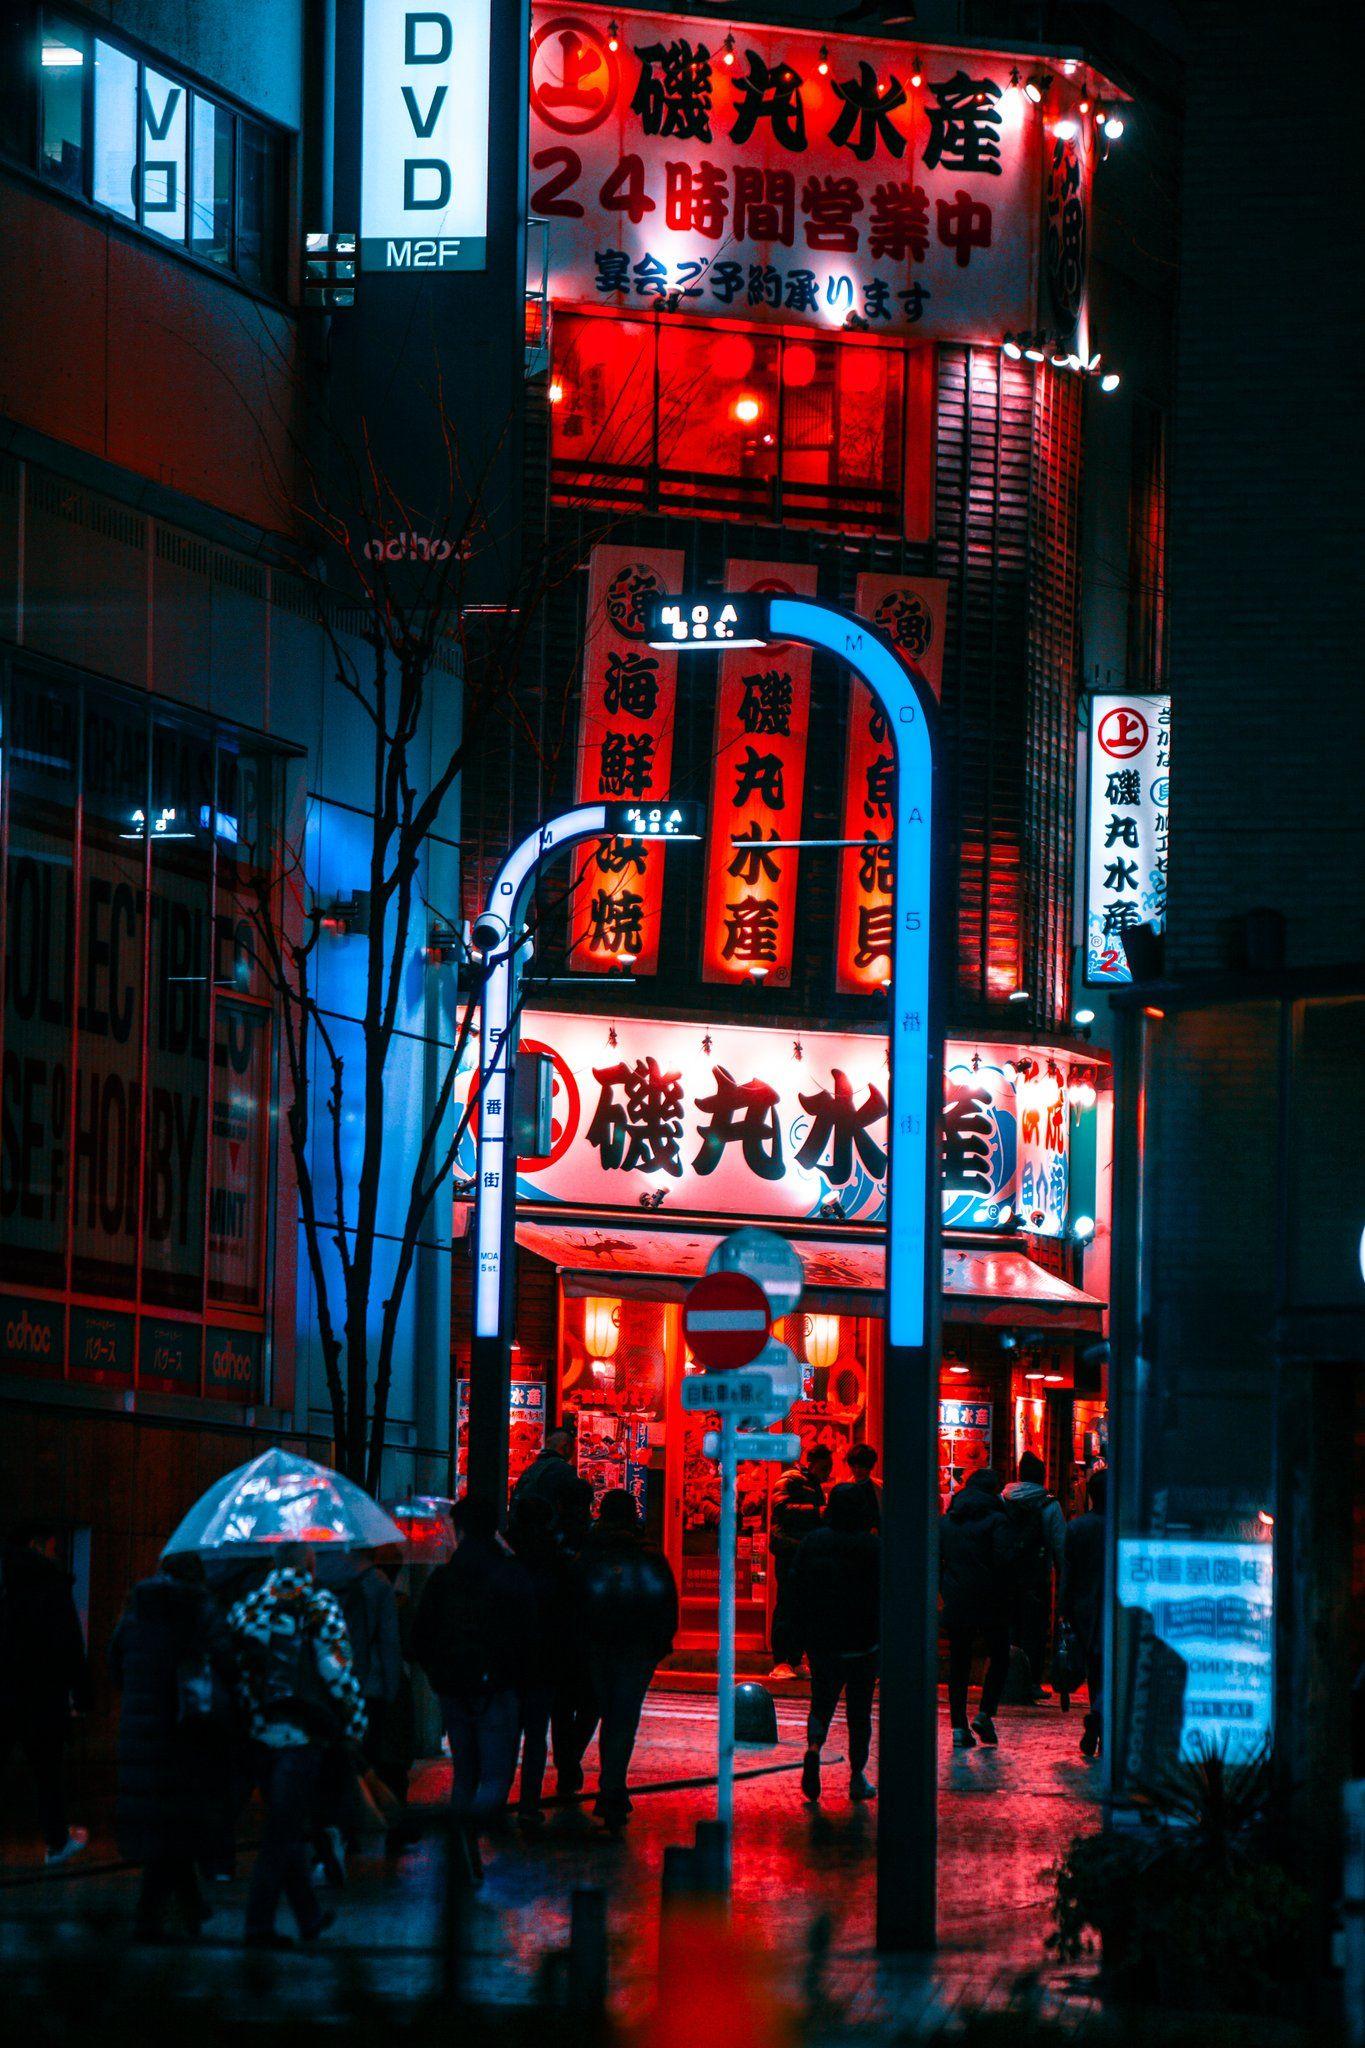 Aishy On Twitter Cyberpunk Aesthetic Aesthetic Japan Night Aesthetic